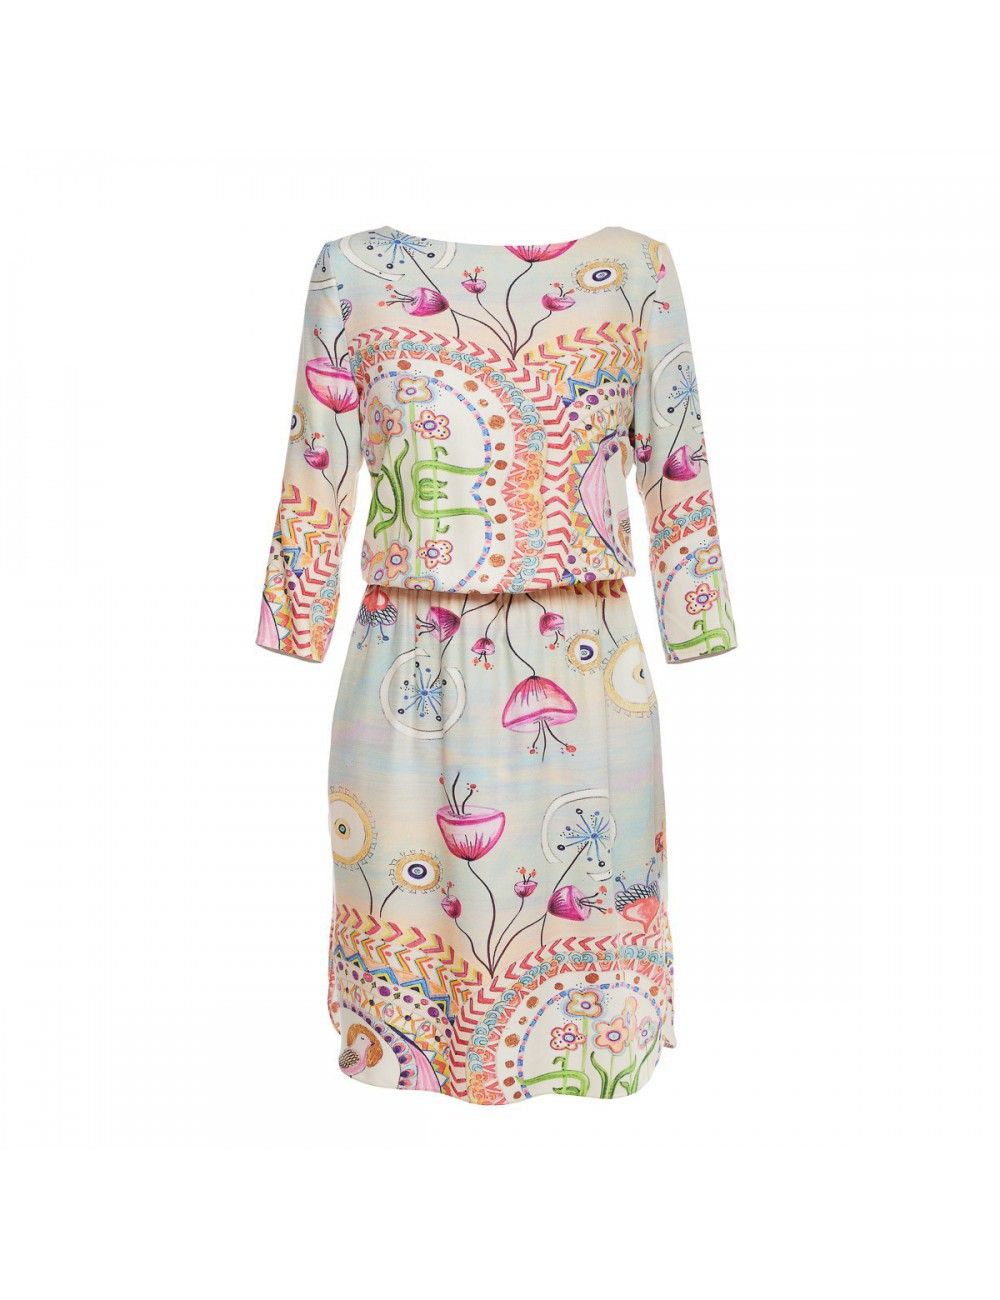 Viscose Dress Happy Hills elastic waist and sleeves